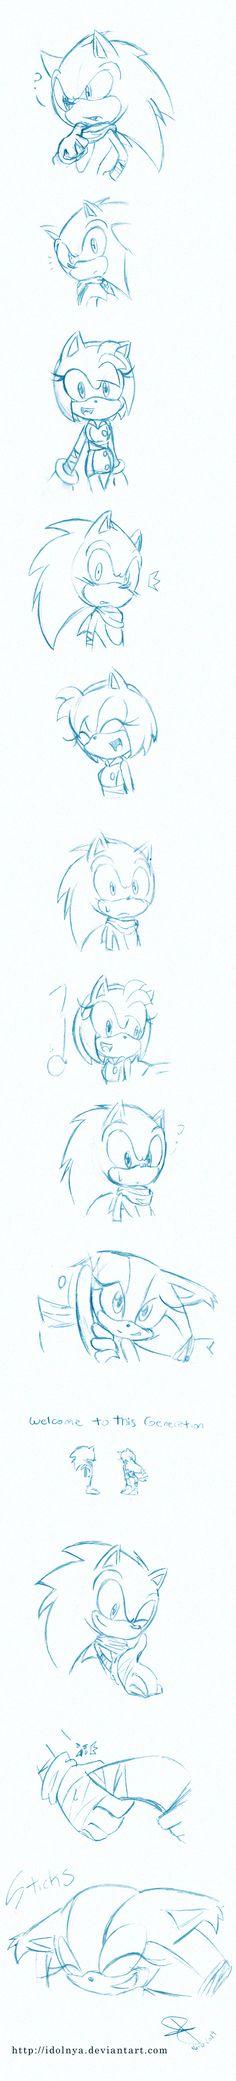 Welcome To Sonic Boom by idolnya.deviantart.com on @DeviantArt